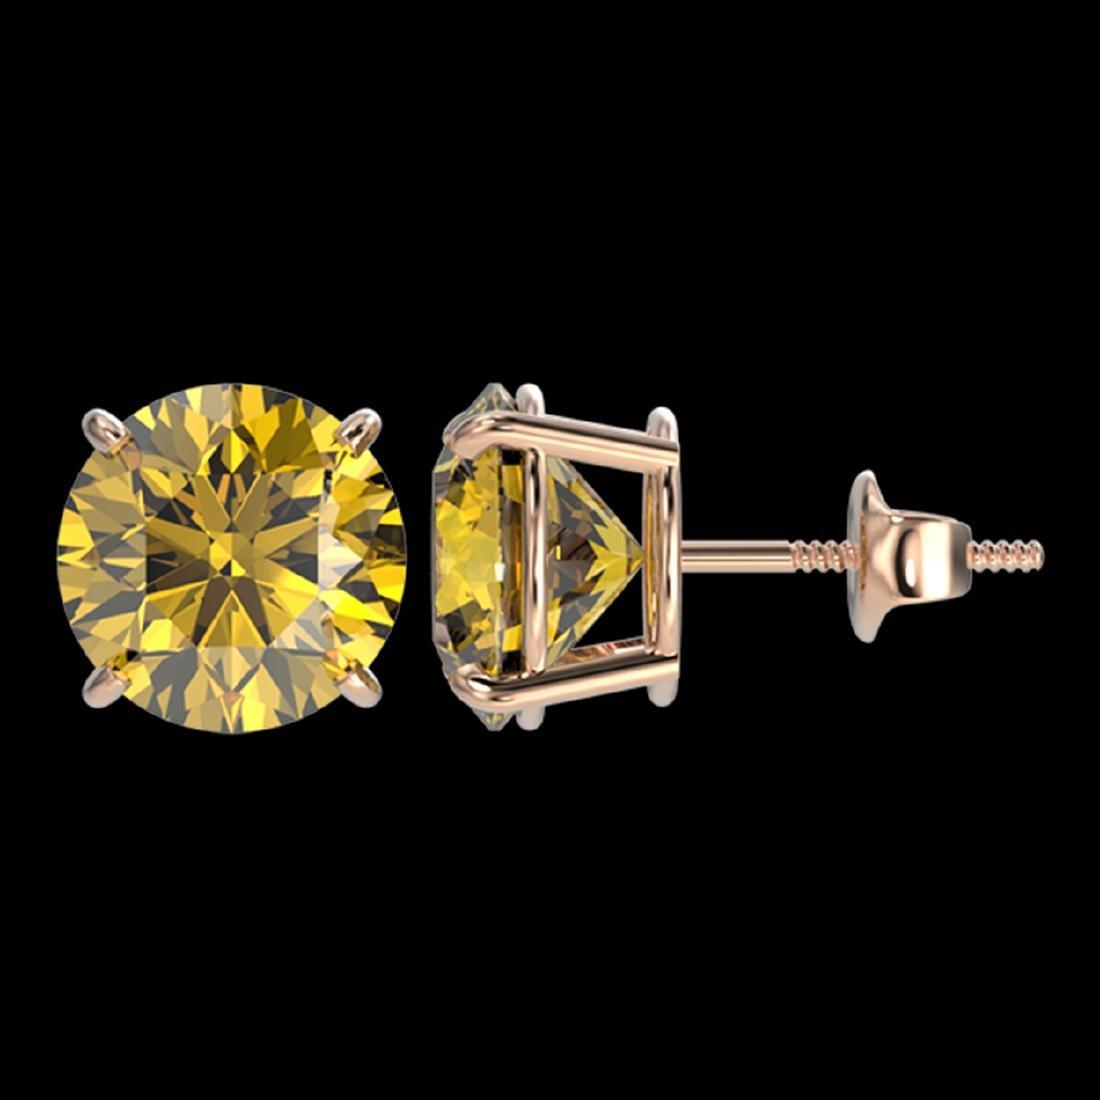 4 ctw Intense Yellow Diamond Stud Earrings 10K Rose - 2